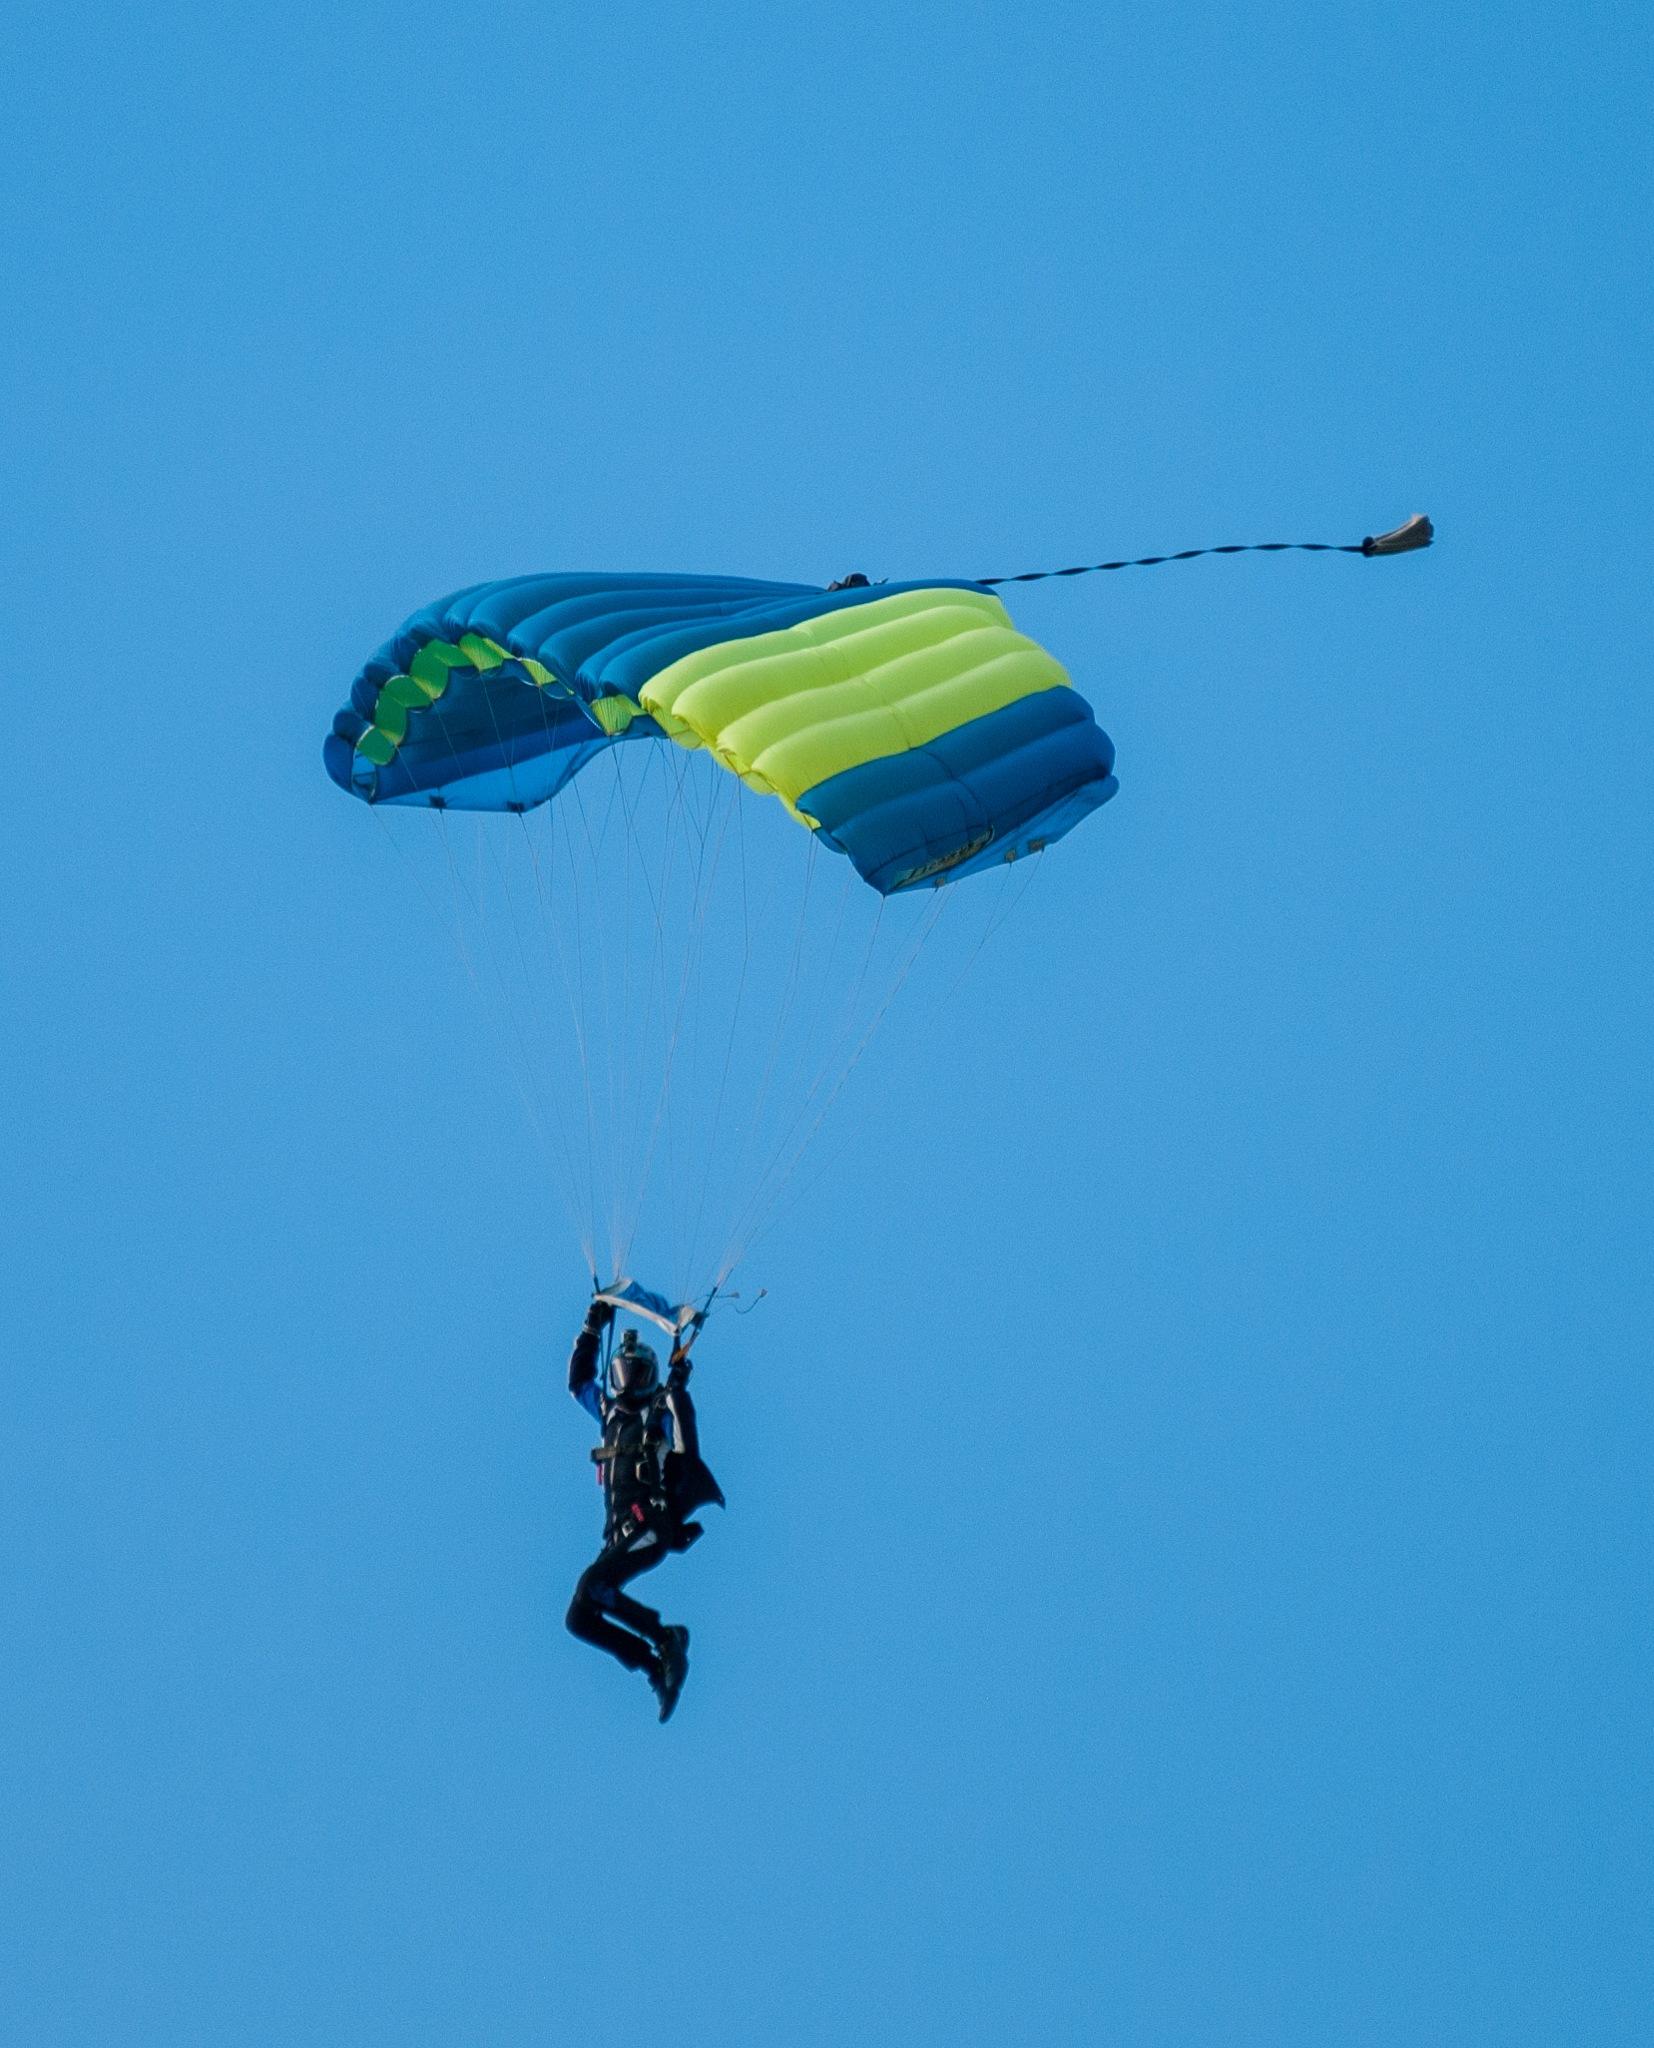 Paracadutista by corvonero